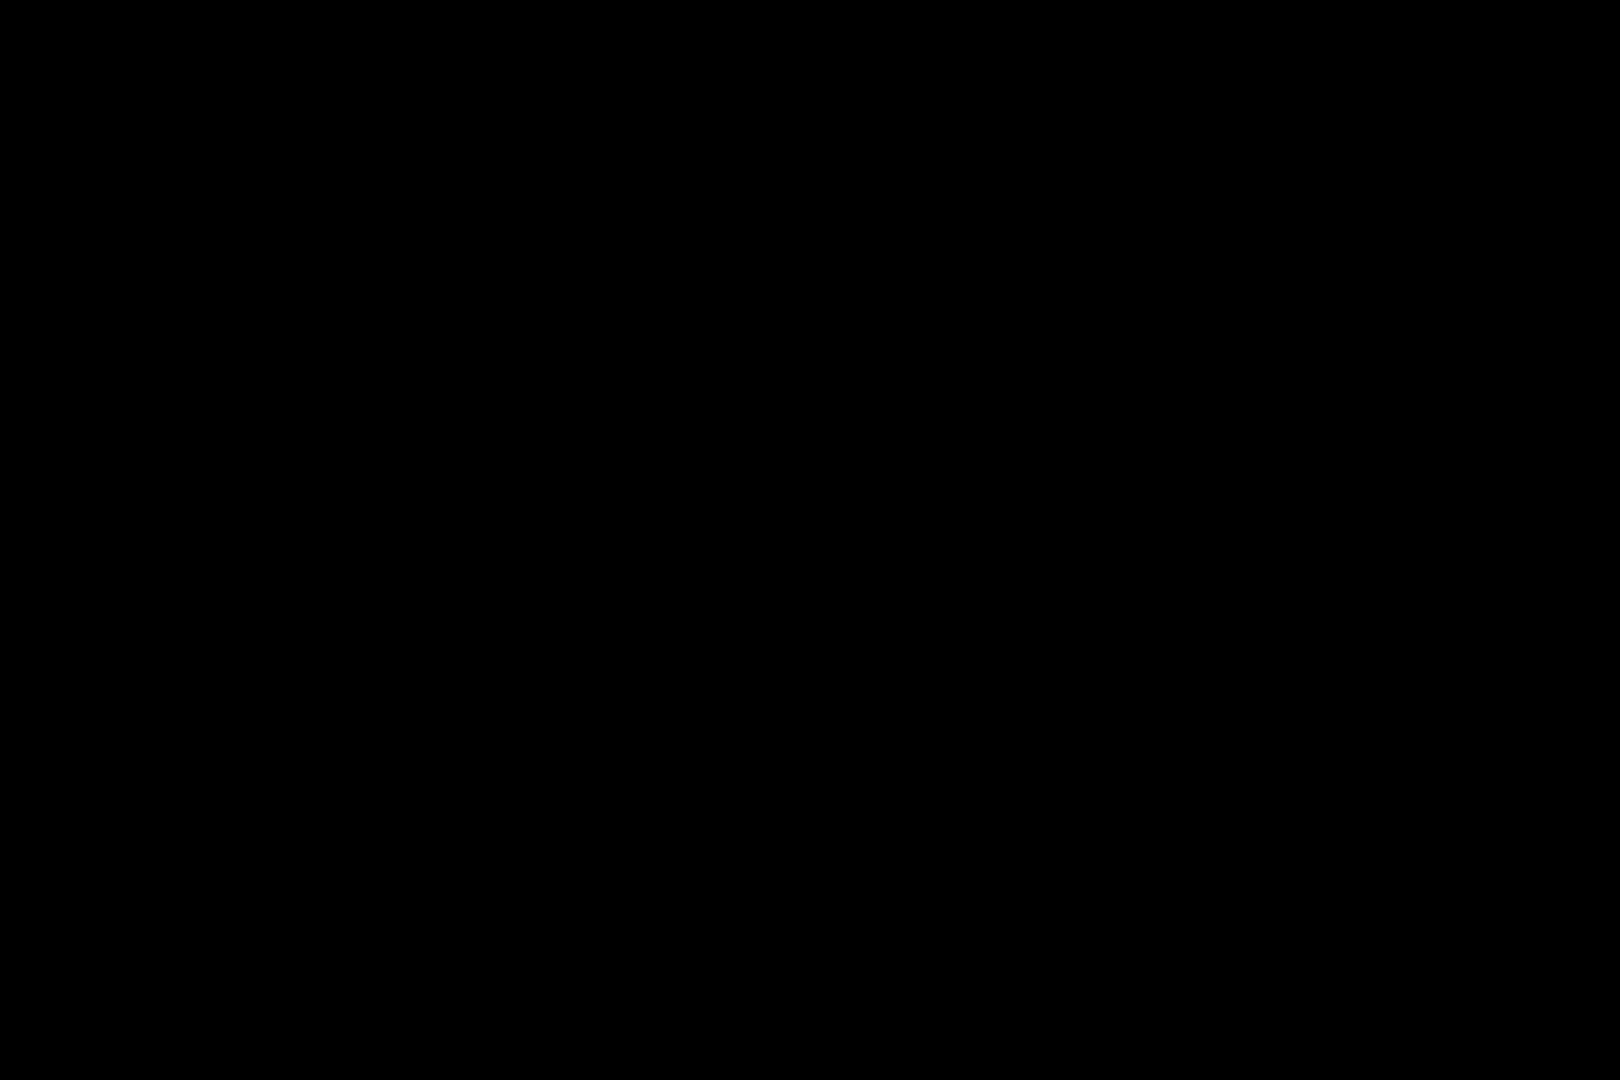 充血監督の深夜の運動会Vol.137 赤外線 性交動画流出 98pic 70